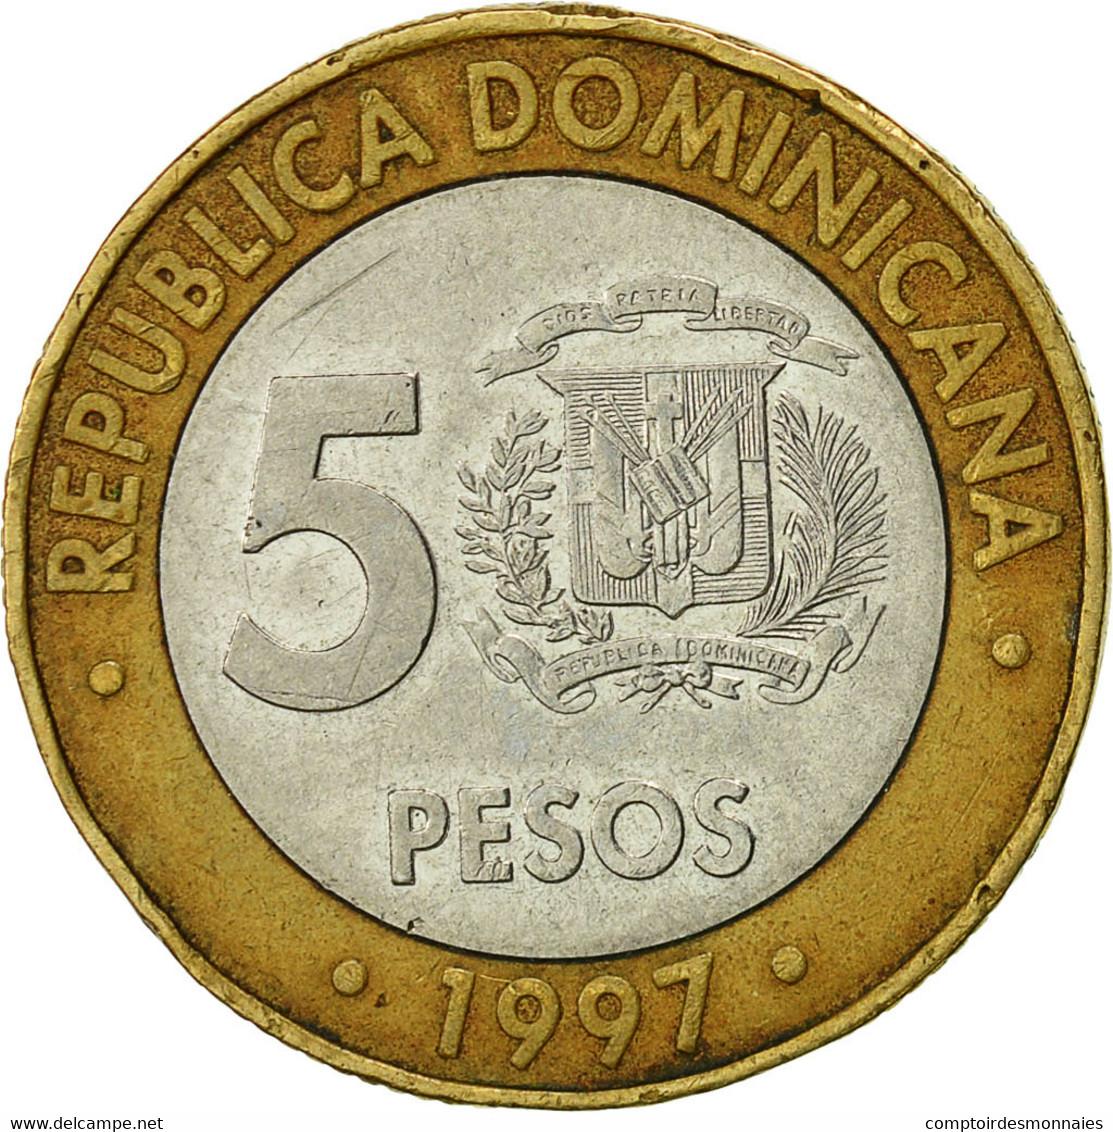 Dominican Republic, 5 Pesos, 1997, TB, Bi-Metallic, KM:88 - Dominicana